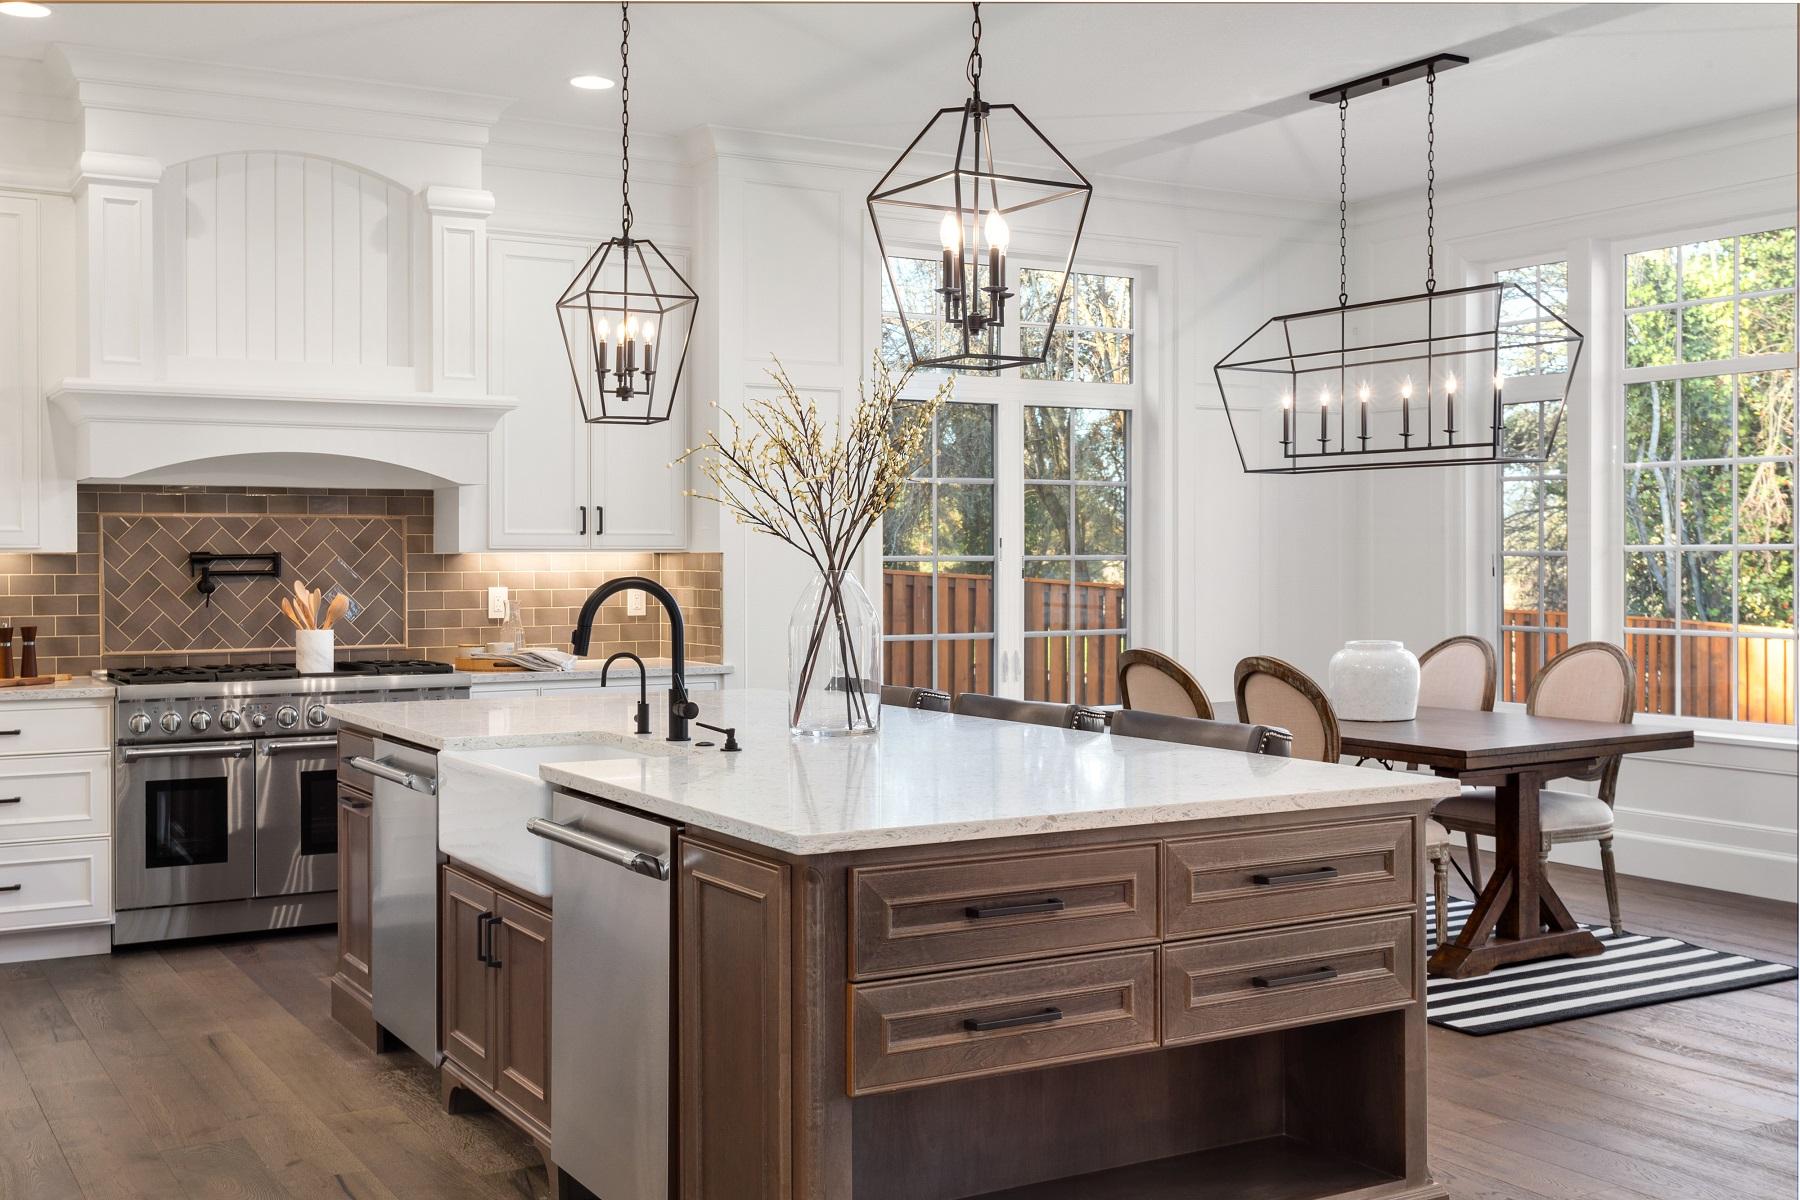 13 Best Steps for Planning Your Full Kitchen Remodeling